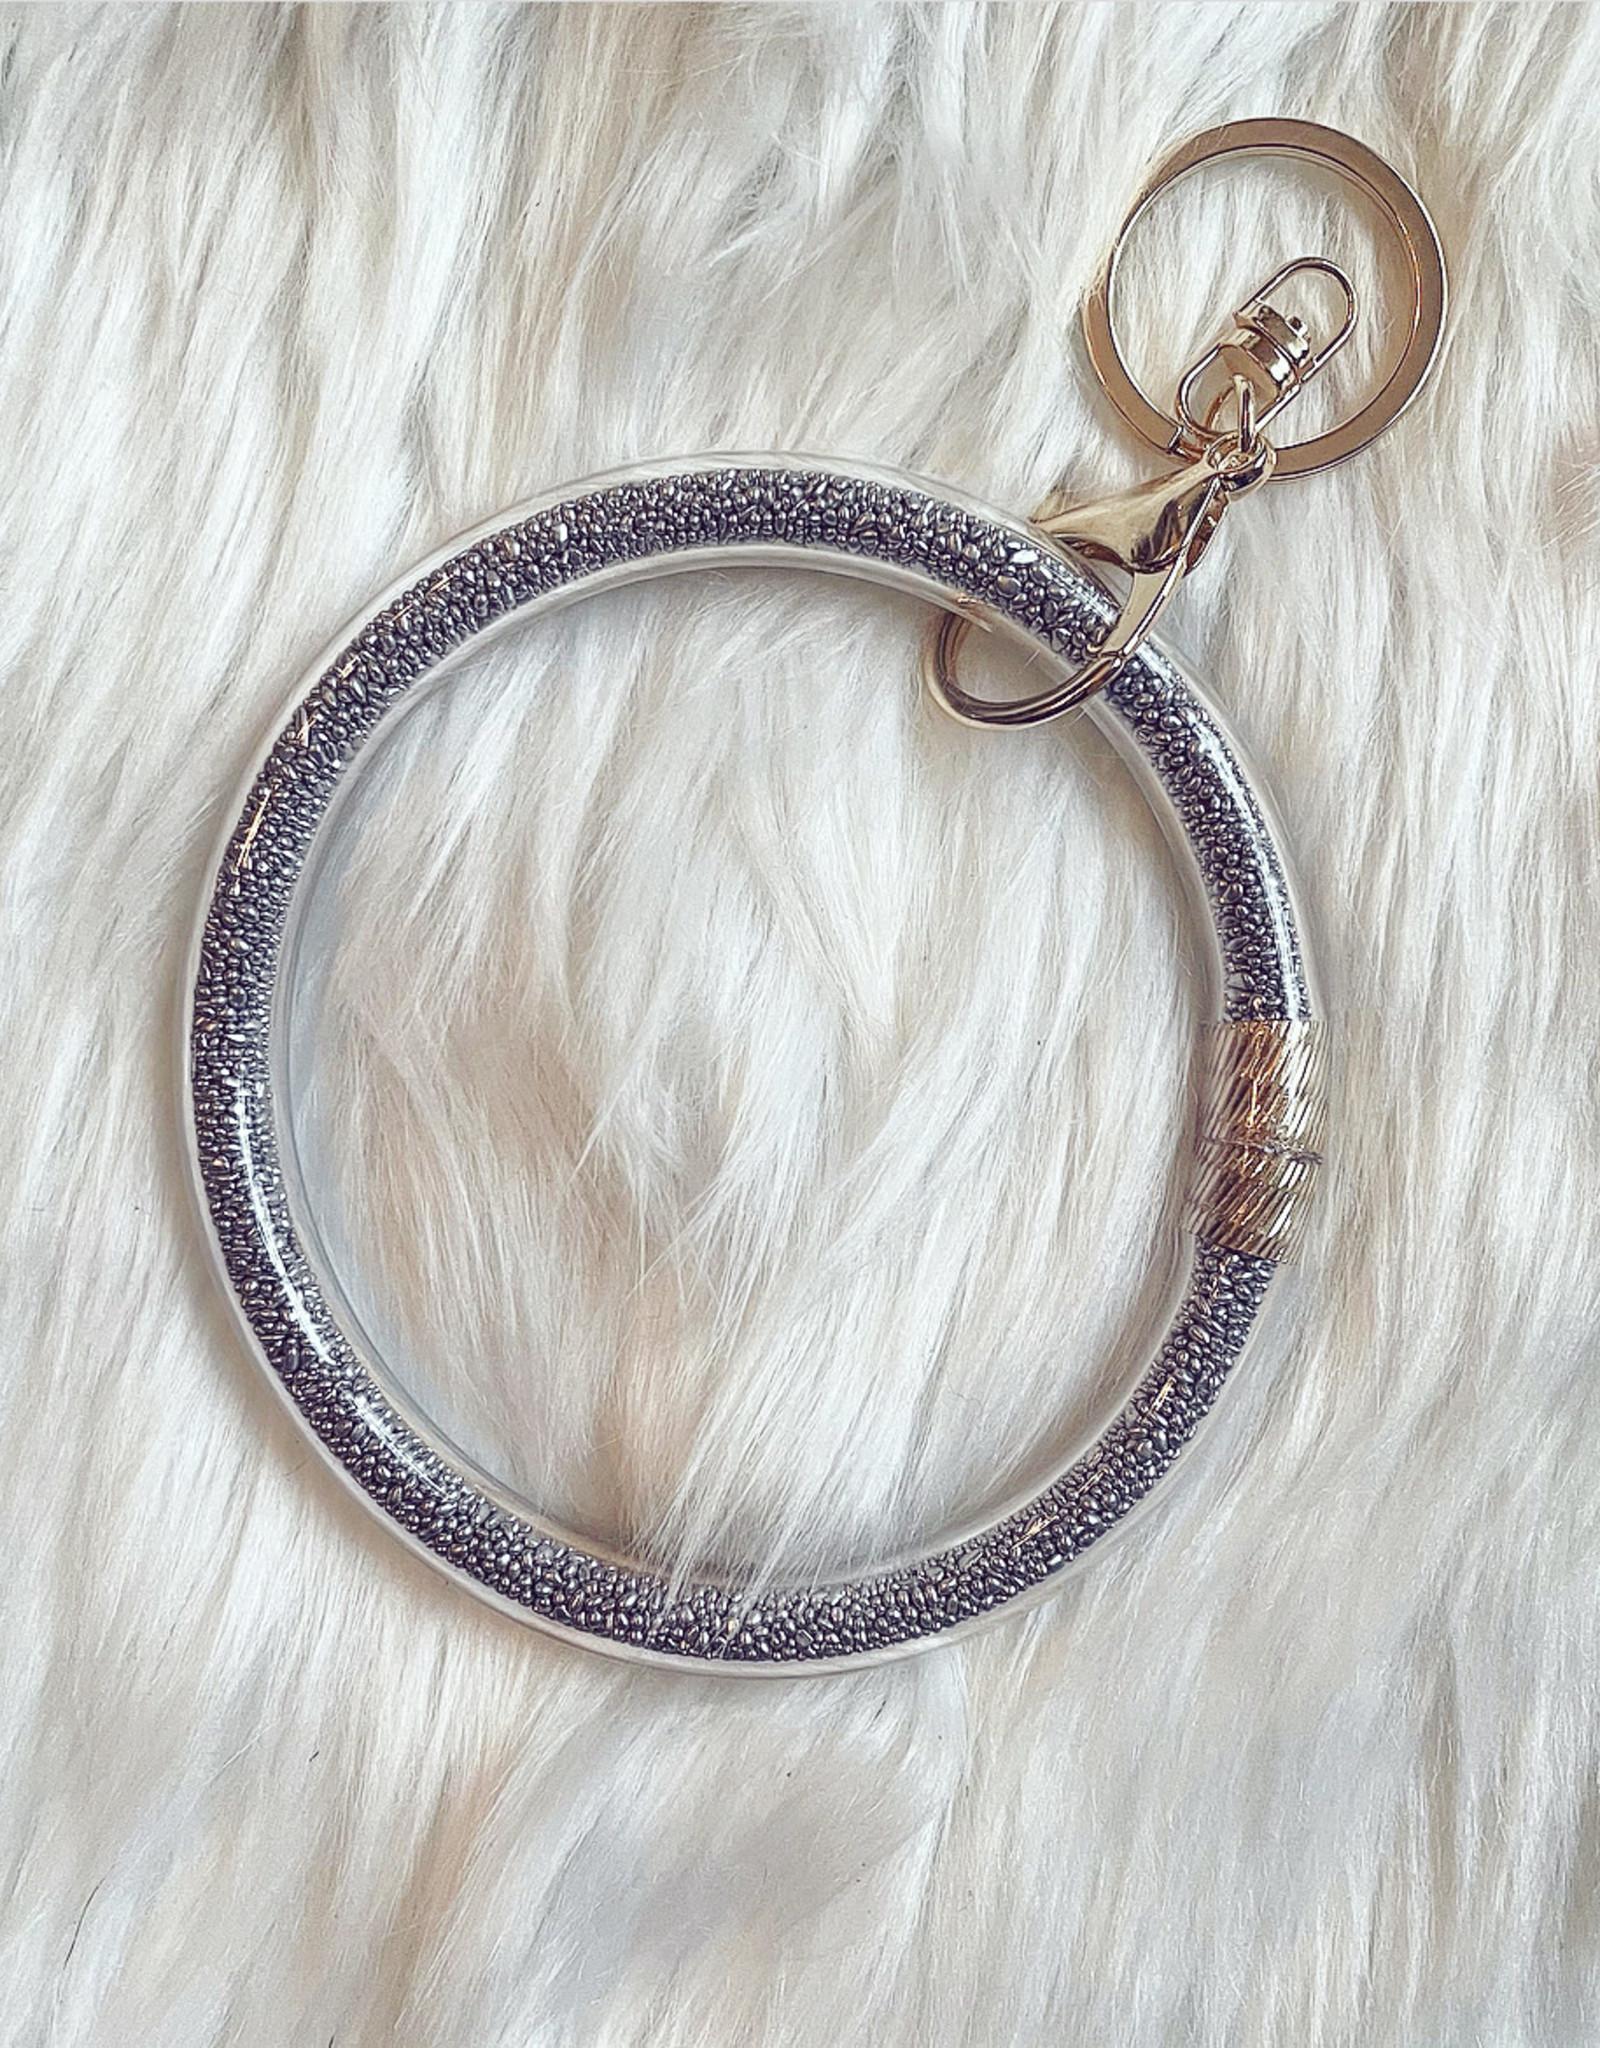 Seed Bead Key Ring Bracelet Silver